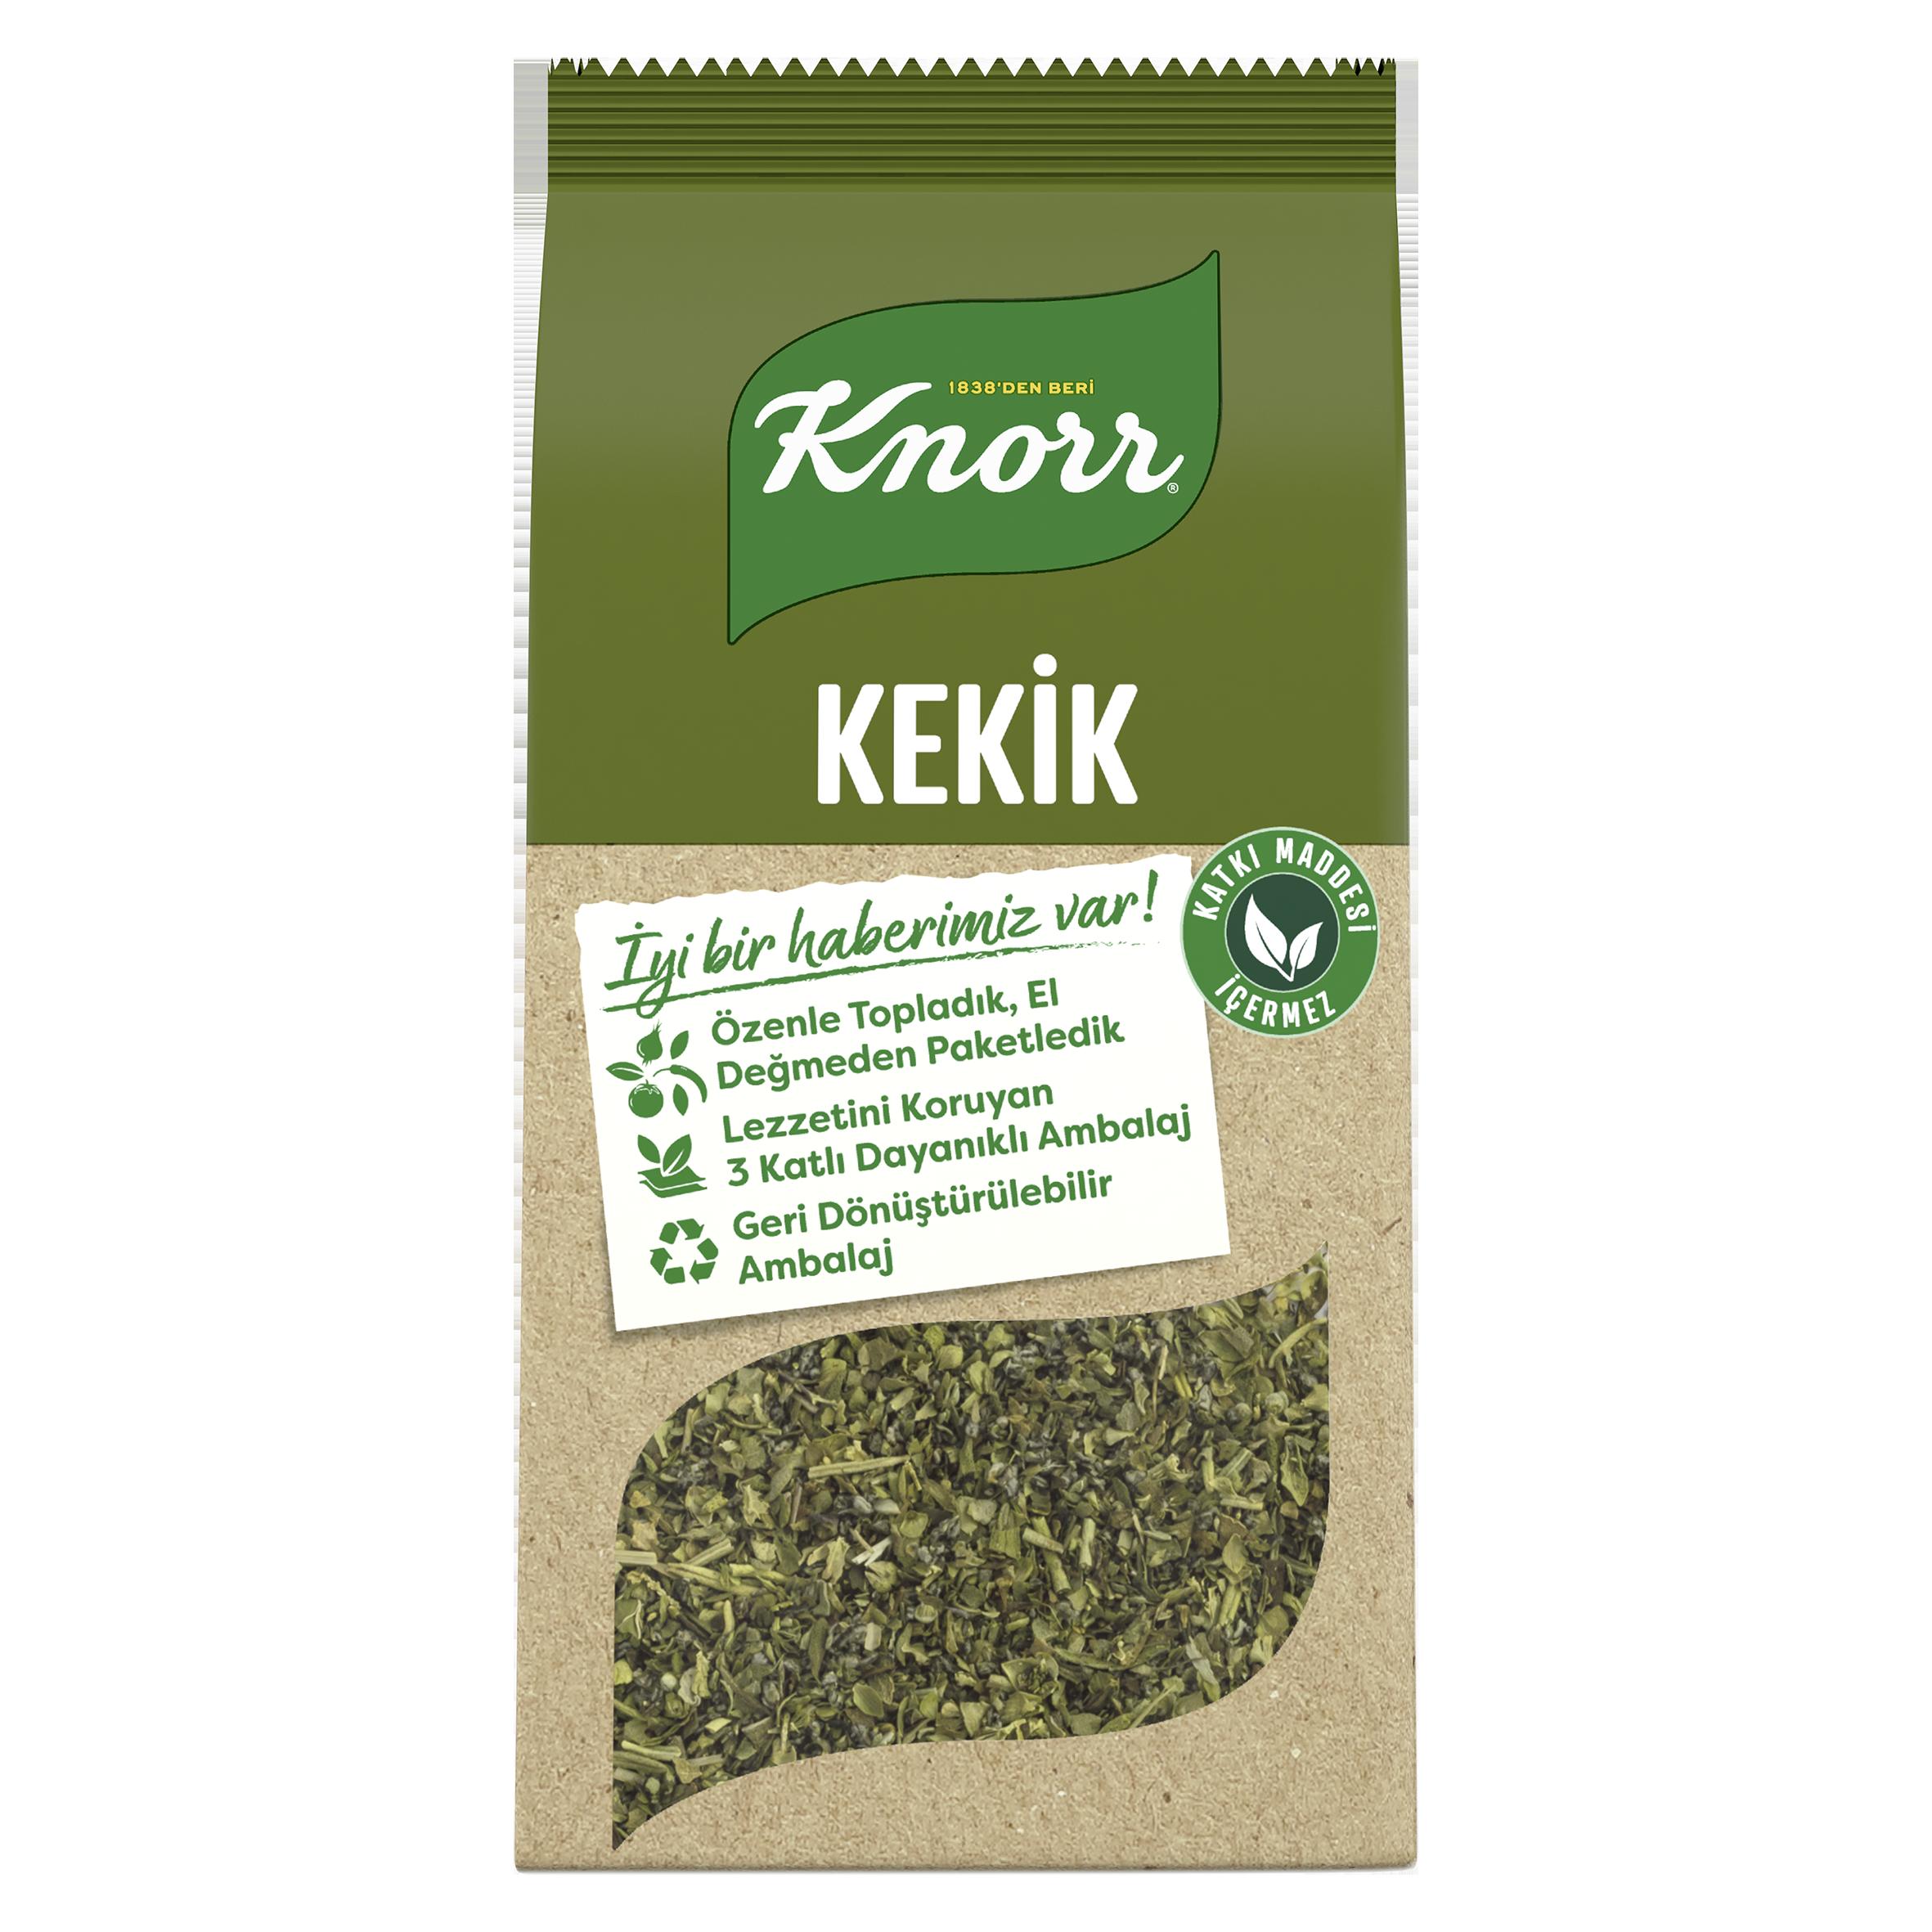 Knorr Kekik